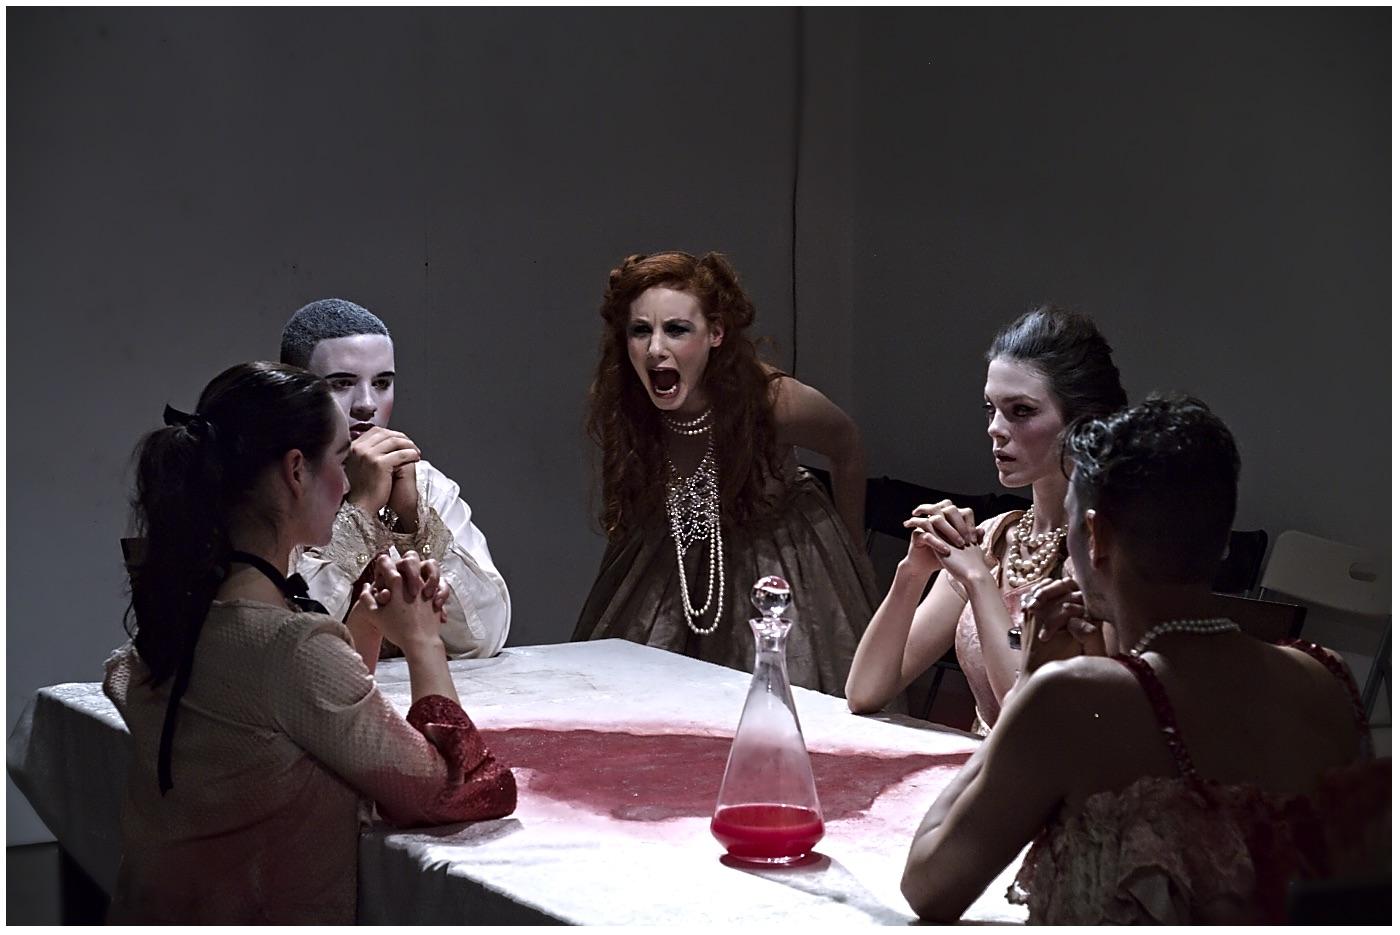 Jennifer White, Cheyne Fynn, Danielle Baynes, Sinead Curry and Nathaniel Scotcher.Photo by Sasha Cohen.